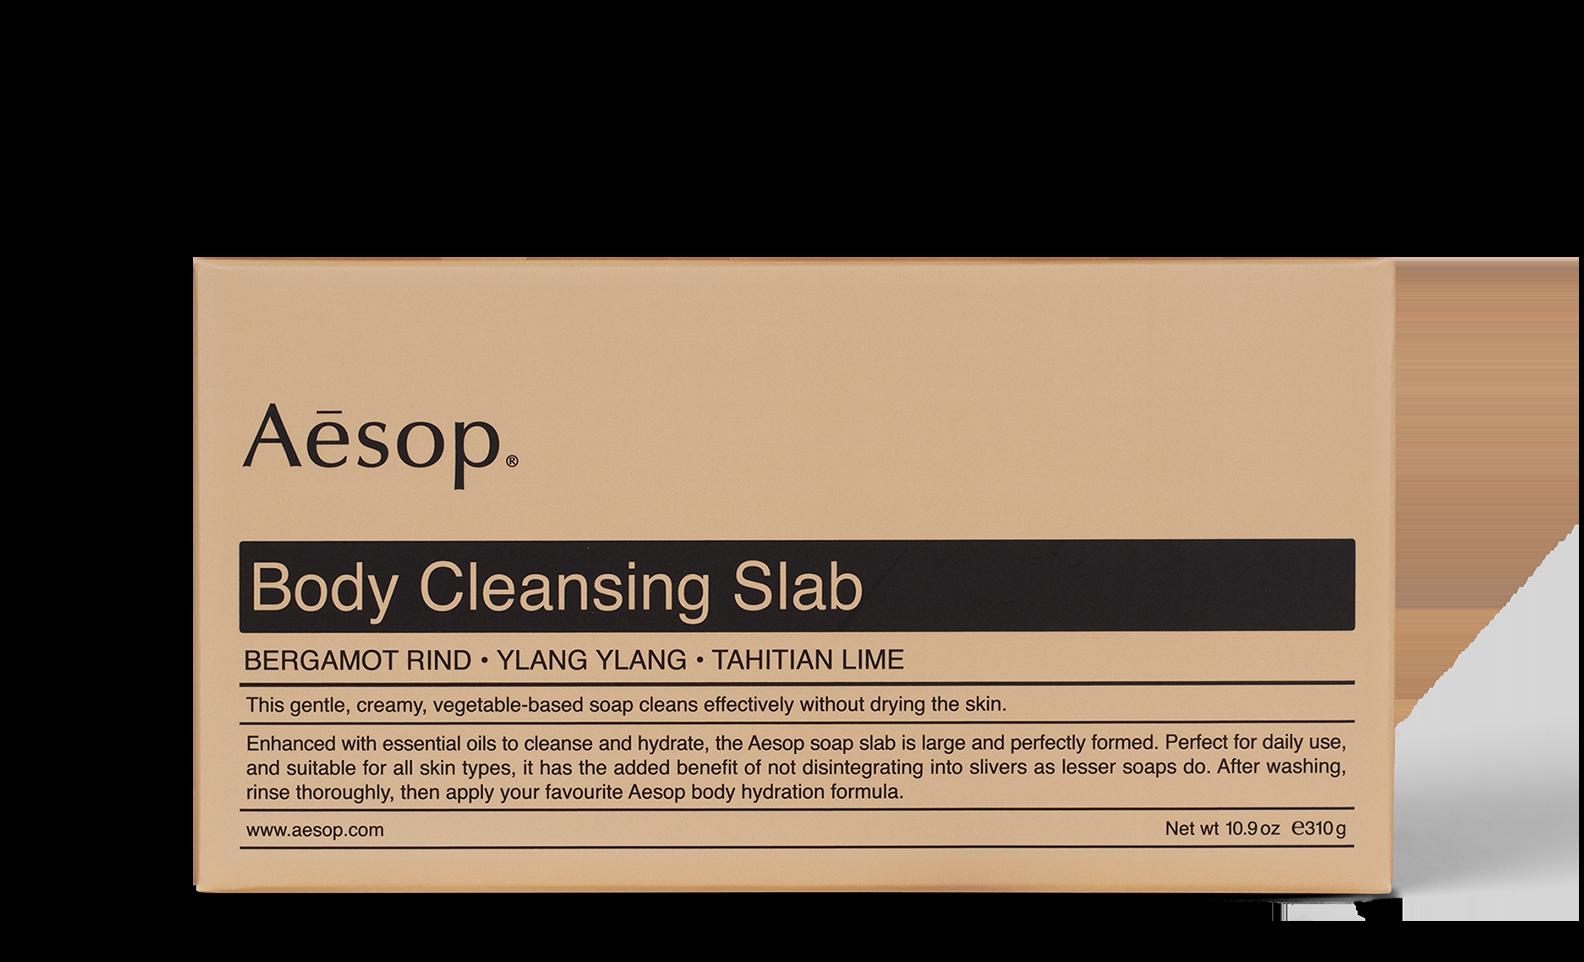 Aesop-Body-Cleansing-Slab-Carton-large.png